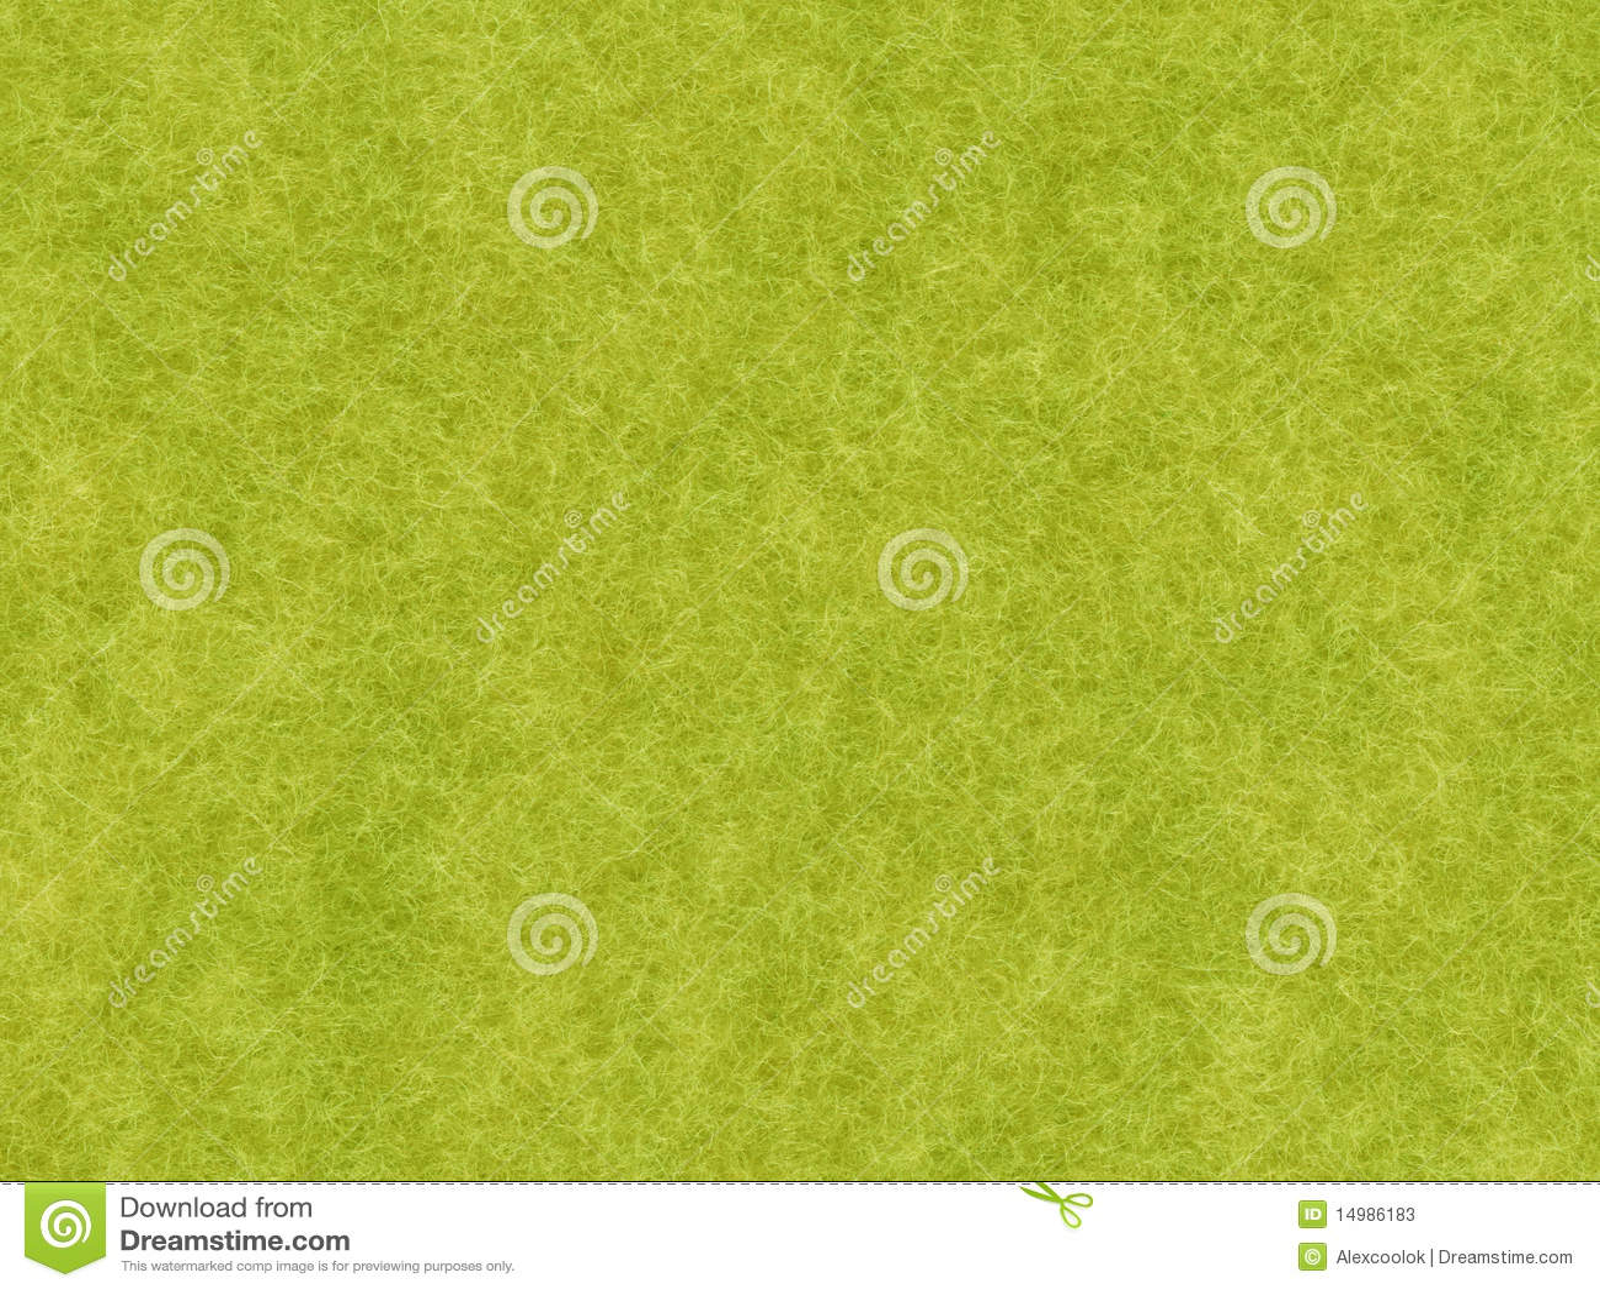 El manuall pintado moer verde